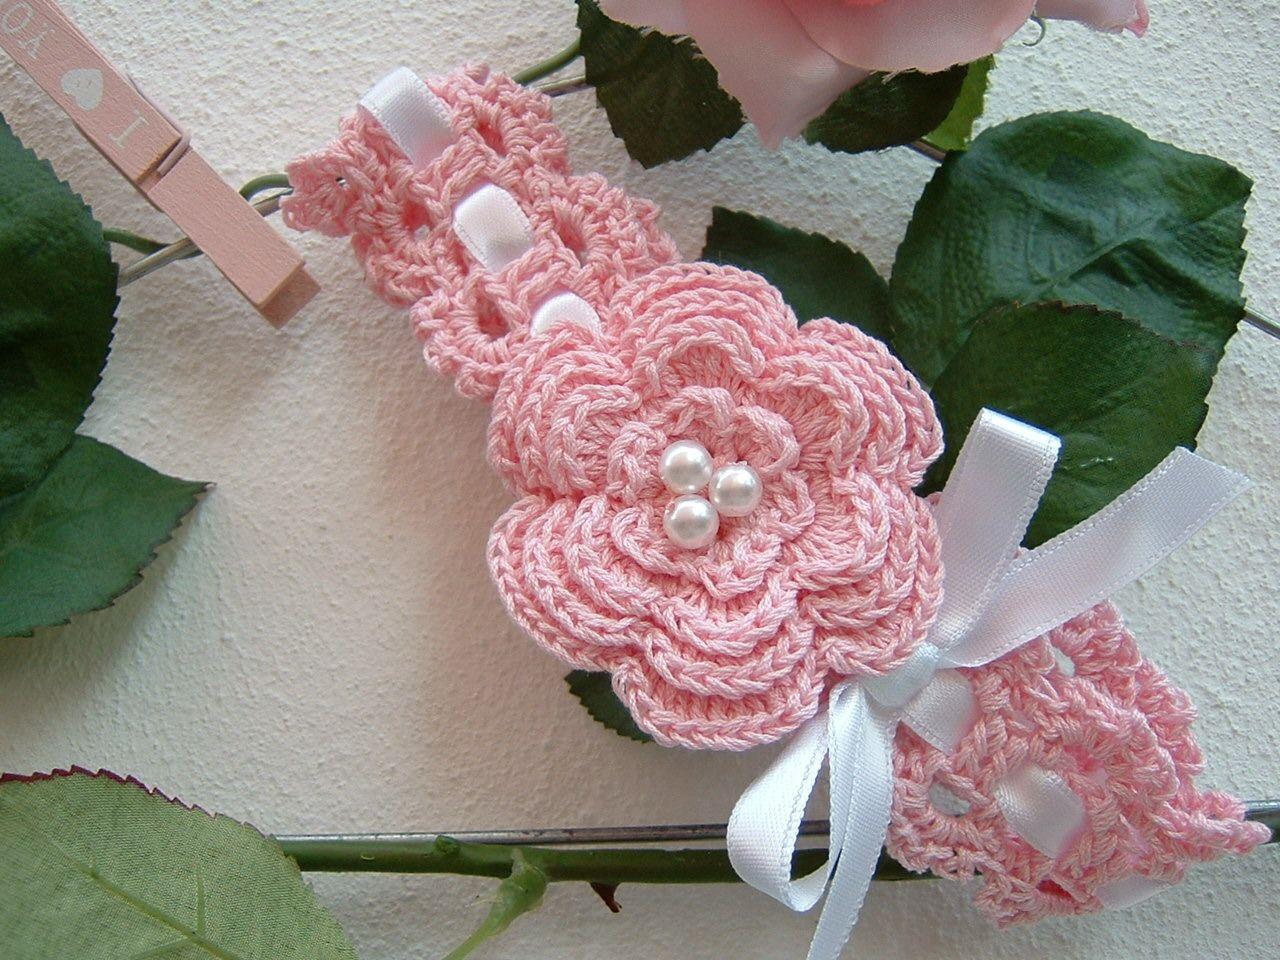 Fascia Di Cotone Rosa Da Bebè Fascia Per Capelli Da Neonata All